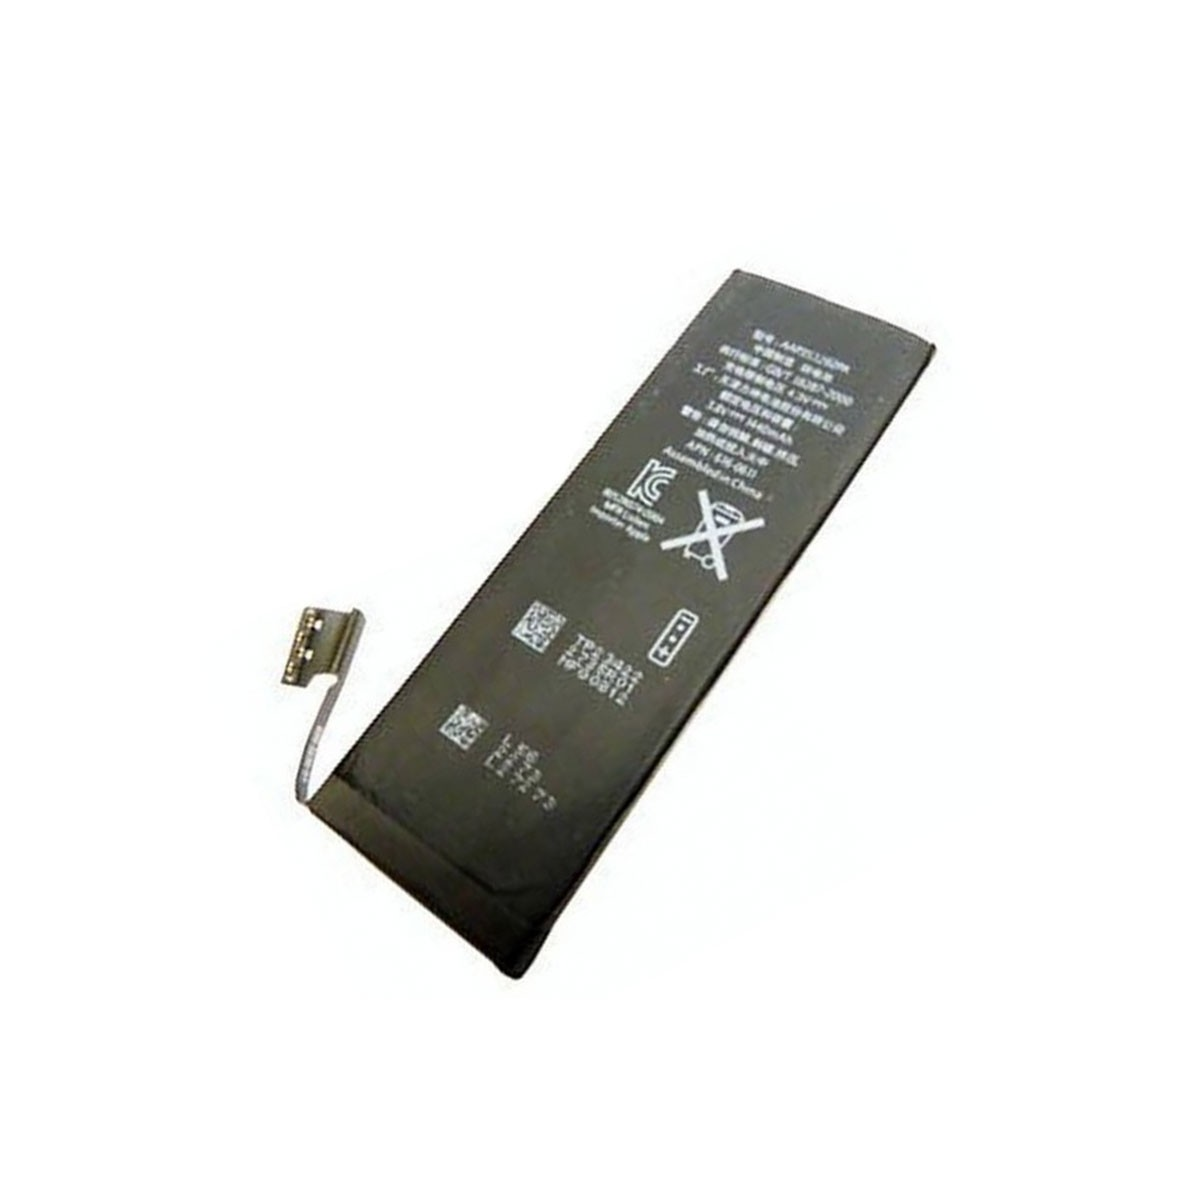 Batería para iphone 5 3.8V 1440mAh